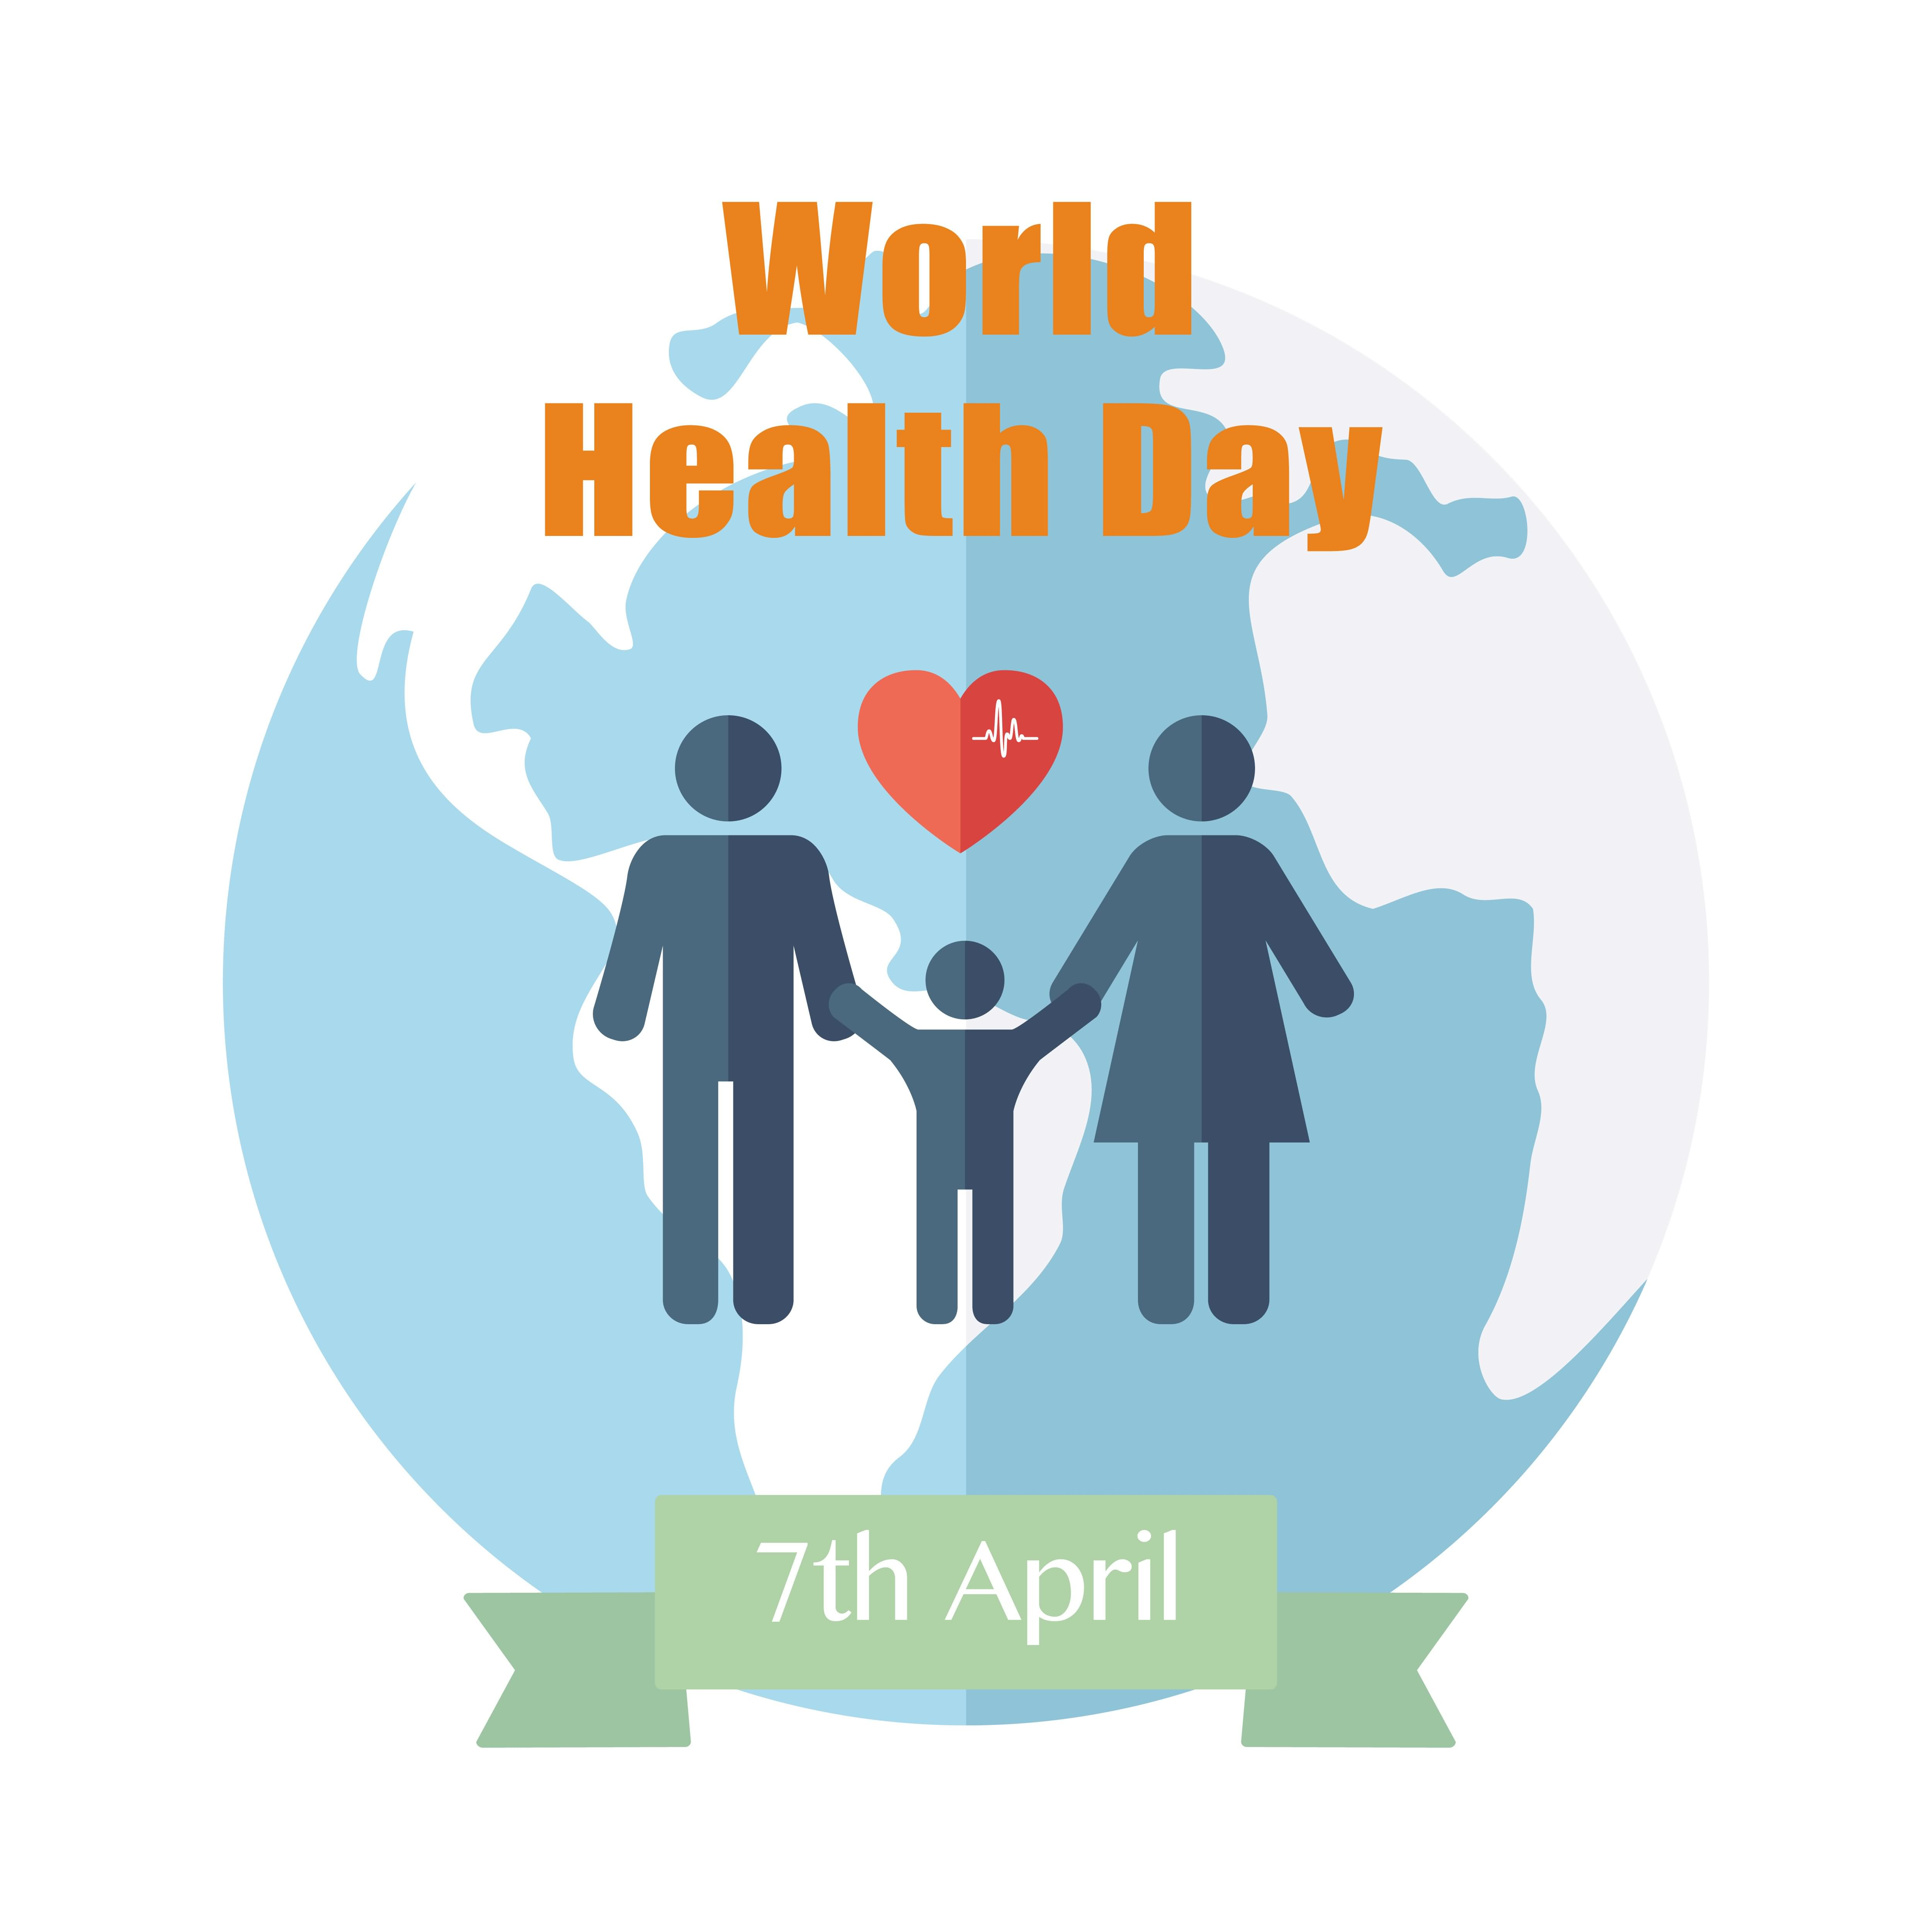 world health day 7th april 2016